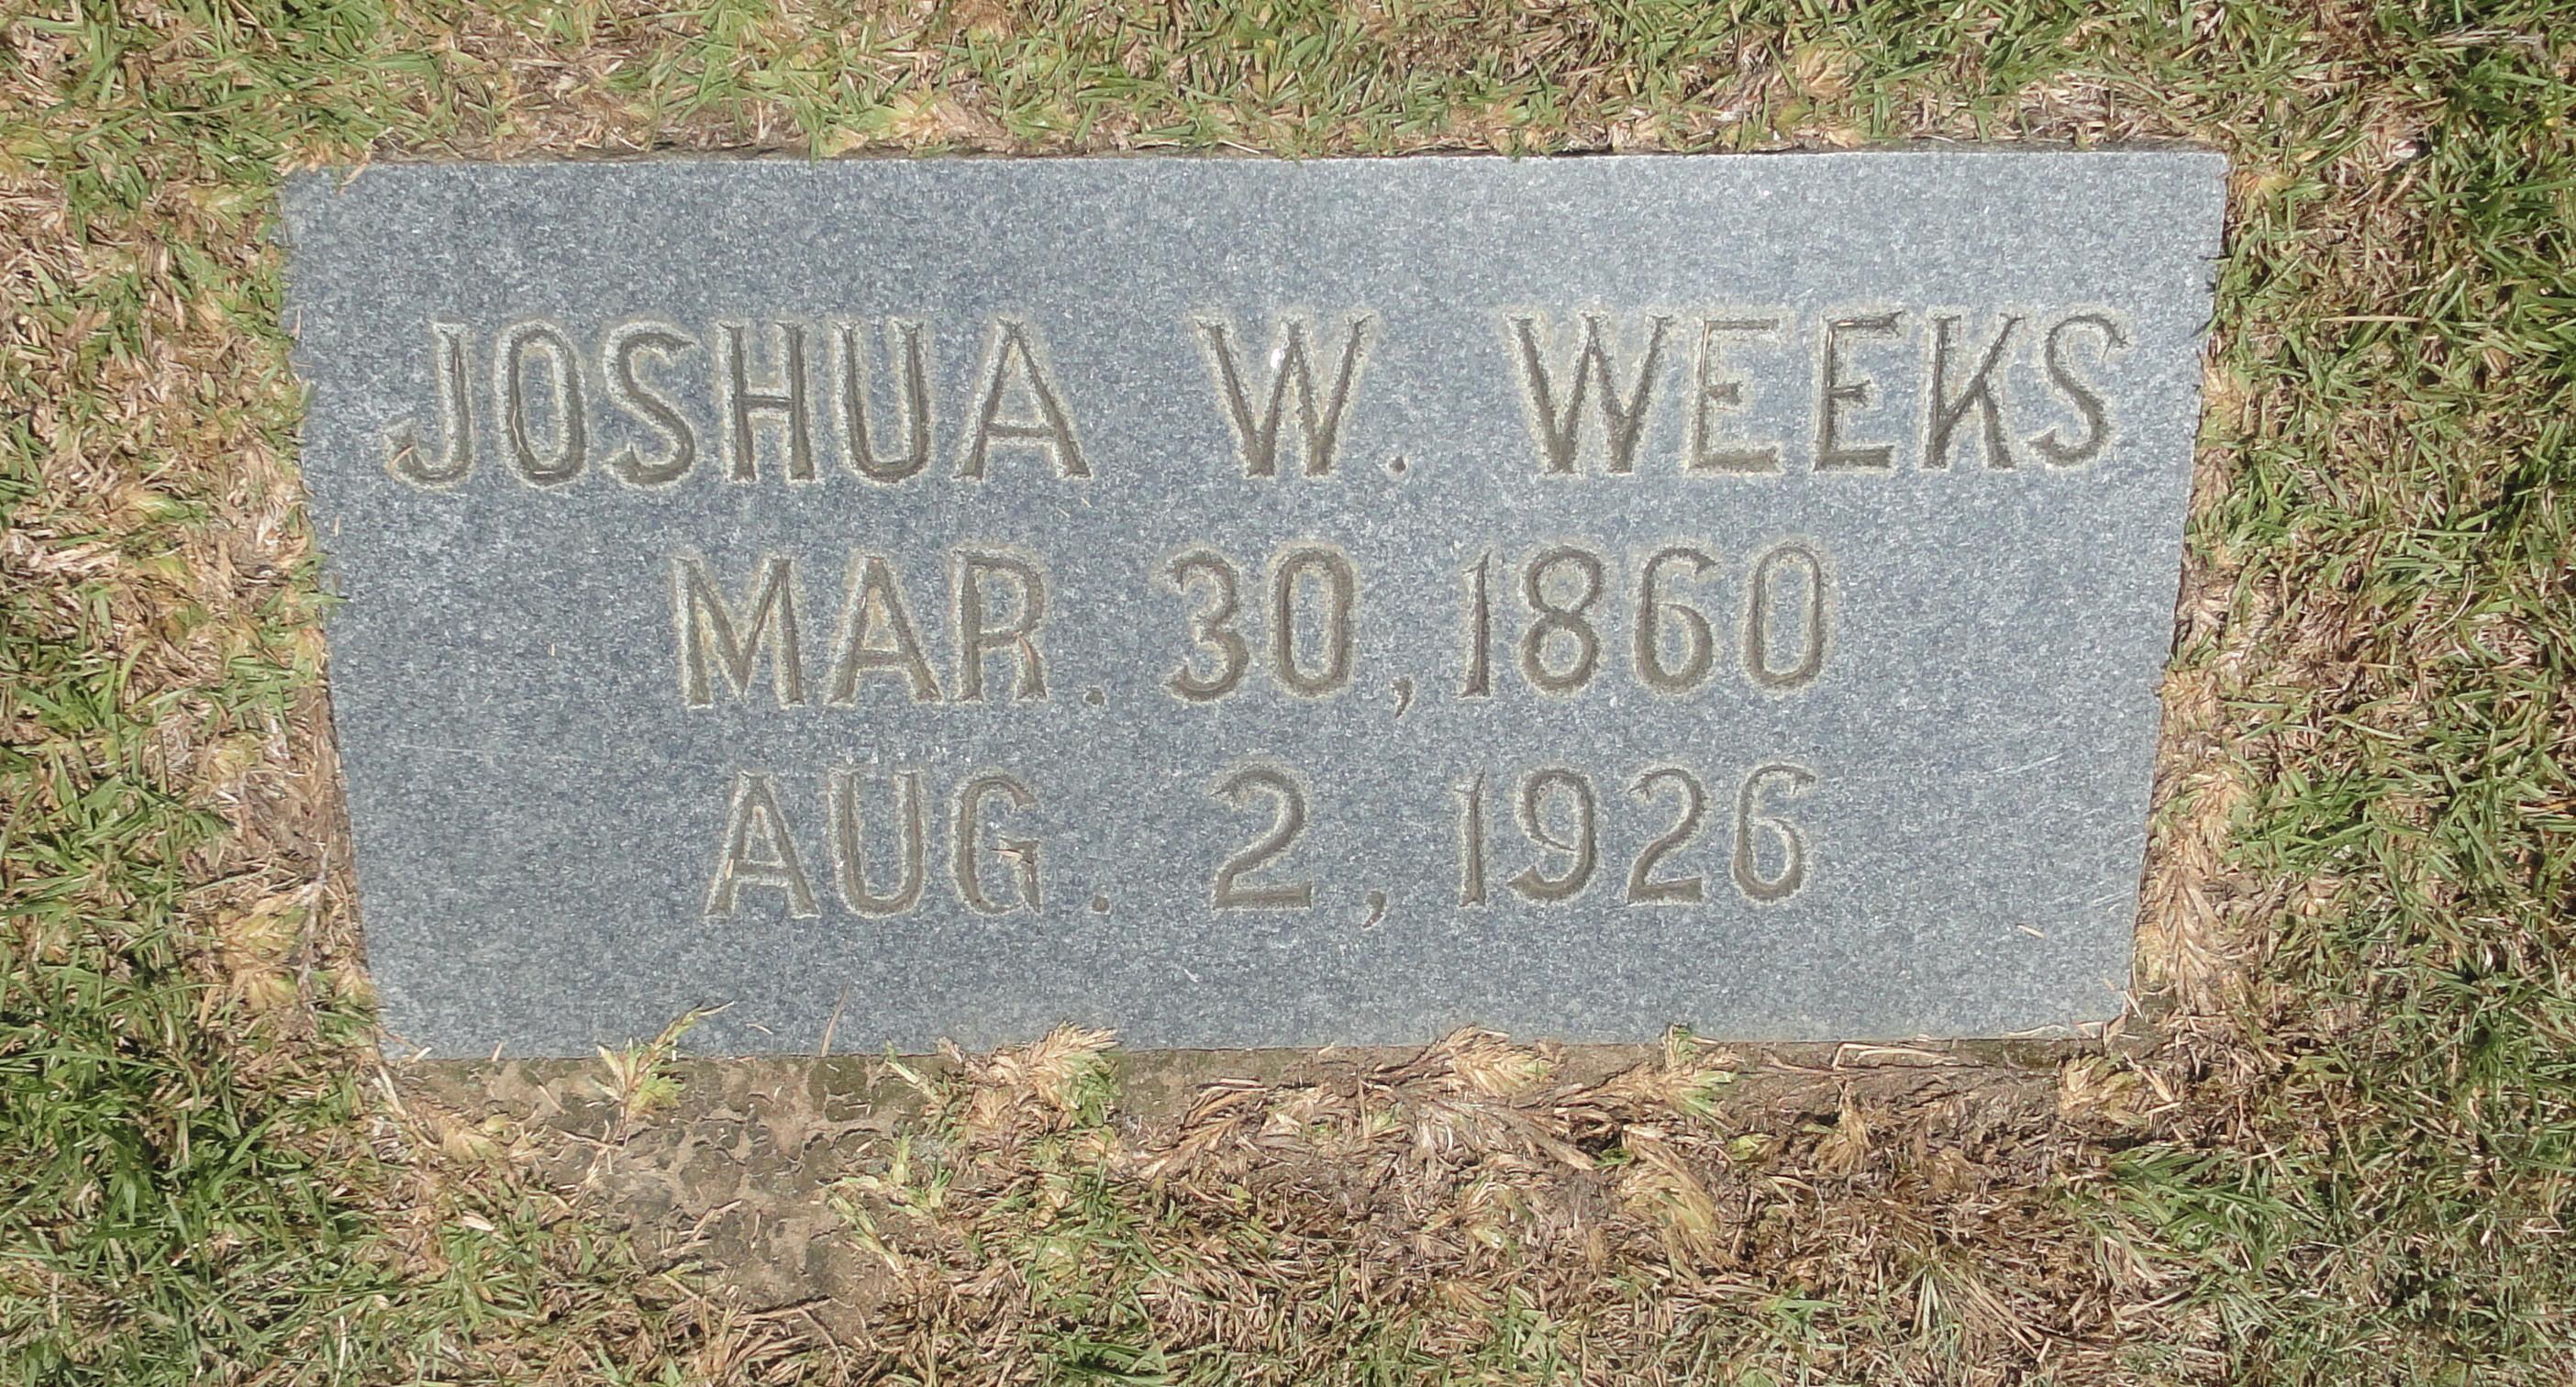 Joshua Wingate Weeks